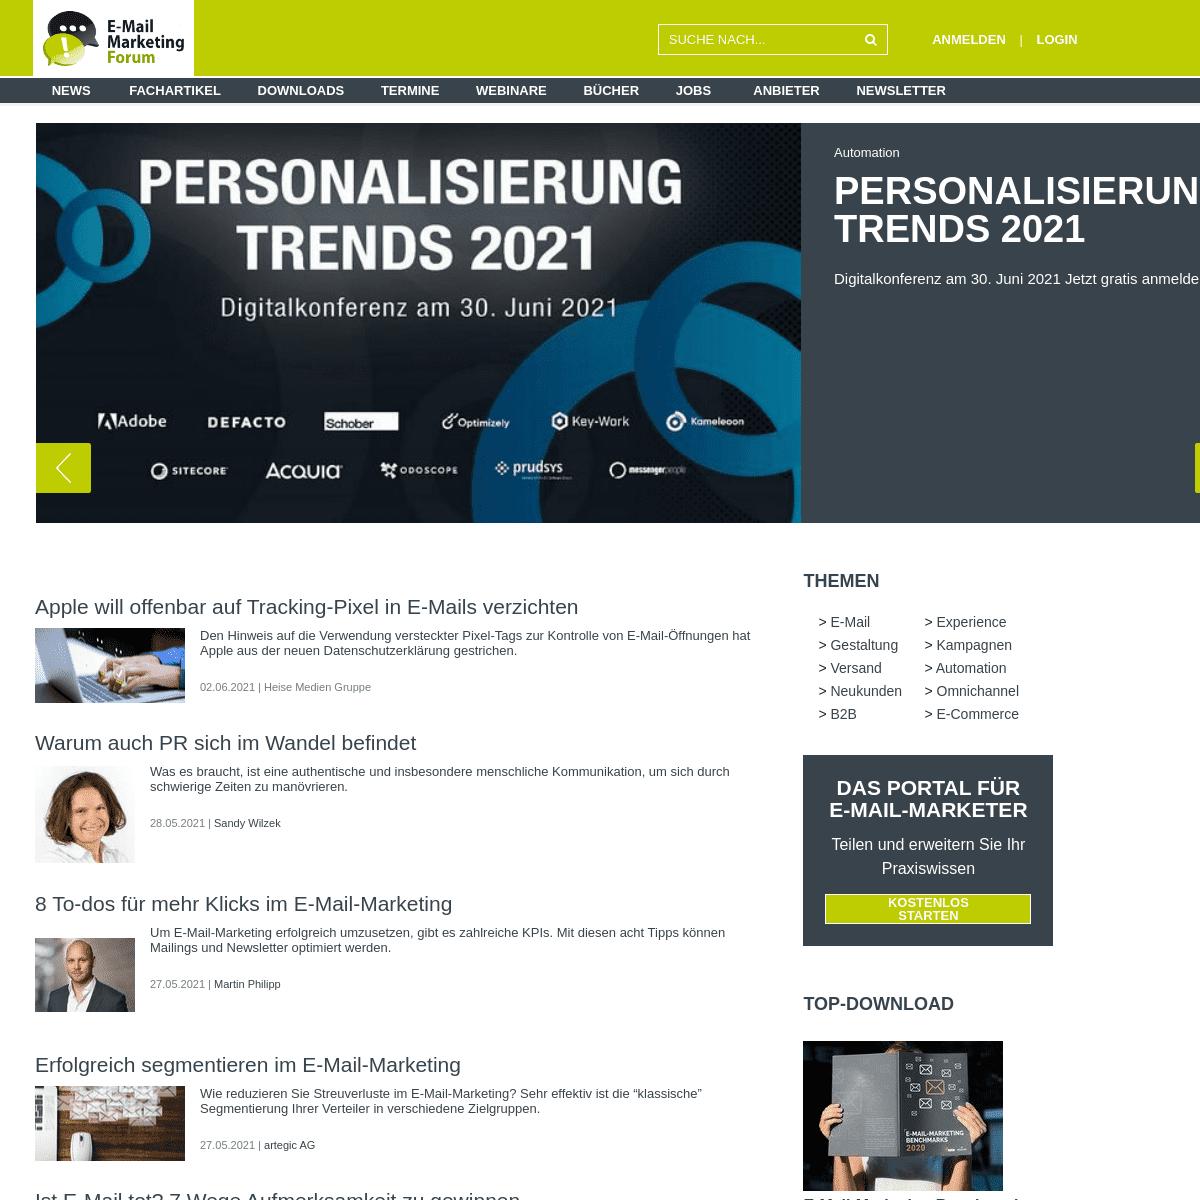 Email-Marketing-Forum